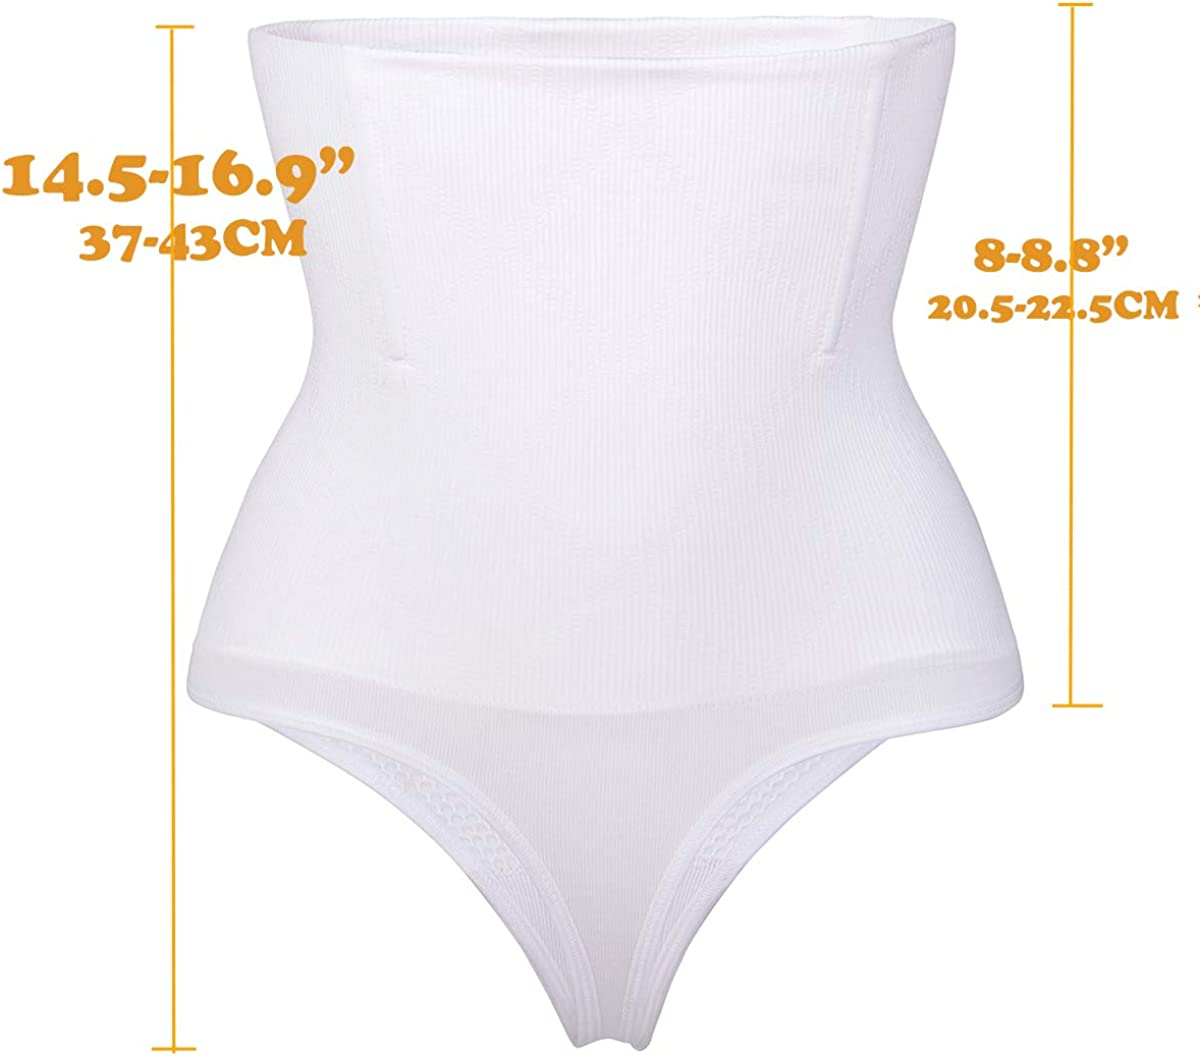 328 Thong Shaper Womens Waist Cincher Trainer High-Waisted Girdle Slimming Body Tummy Control Panty Shapewear